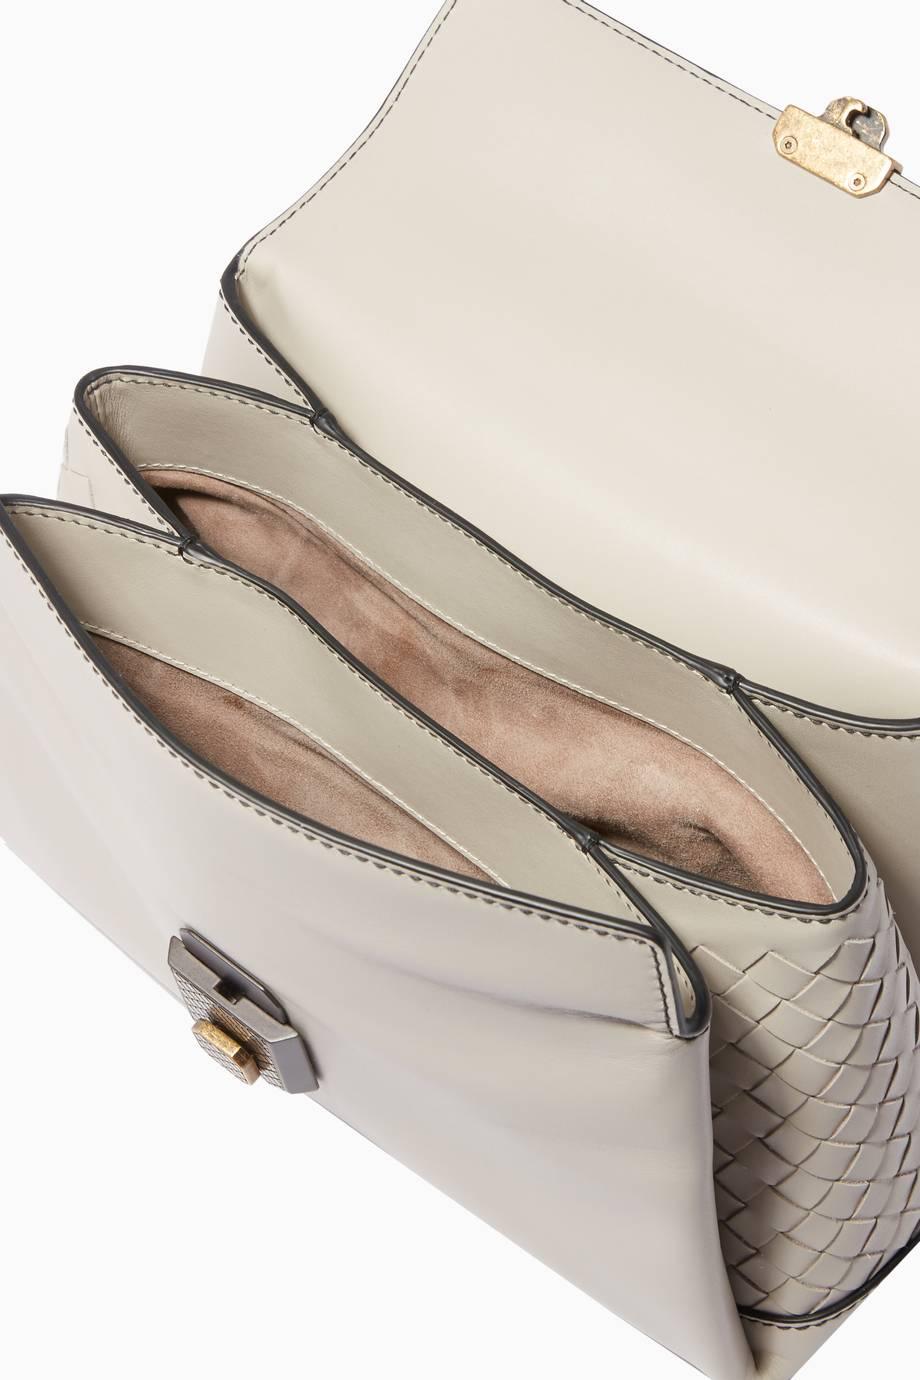 Shop Luxury Bottega Veneta Light-Grey Small Nappa Piazza Top Handle ... aa510886c2e19